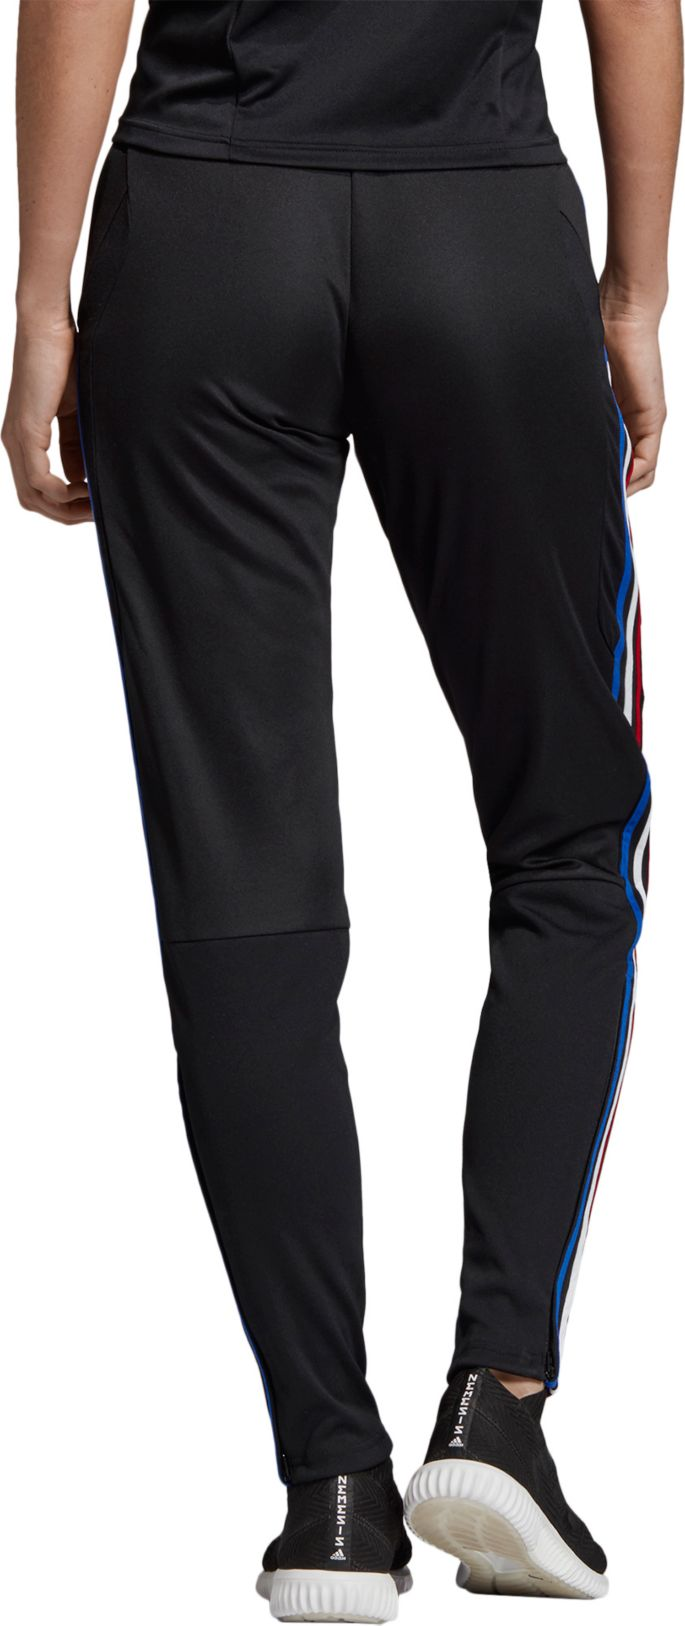 adidas Performance Women ID Tiro Pants Black & White Bring